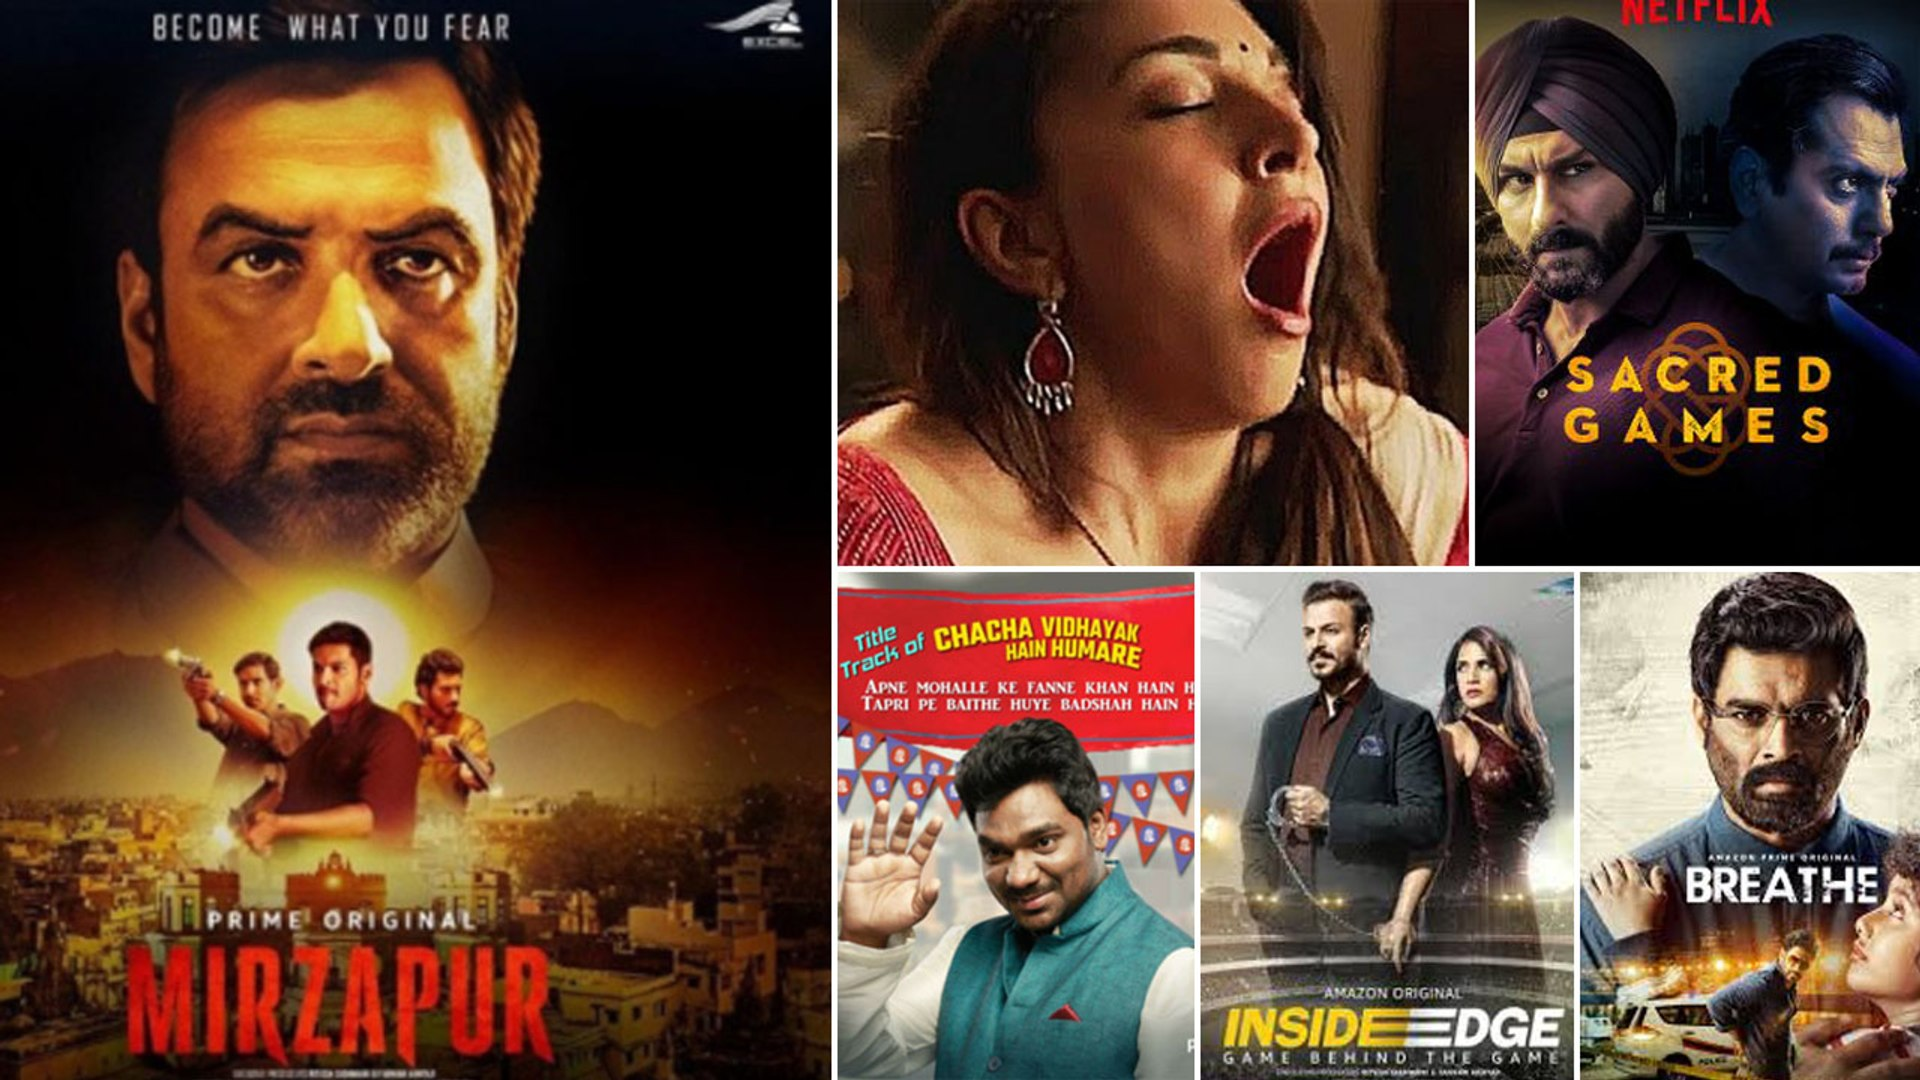 Mirzapur के अलावा Netflix & Amazon Prime की Top 5 Indian Web Series |  वनइंडिया हिंदी